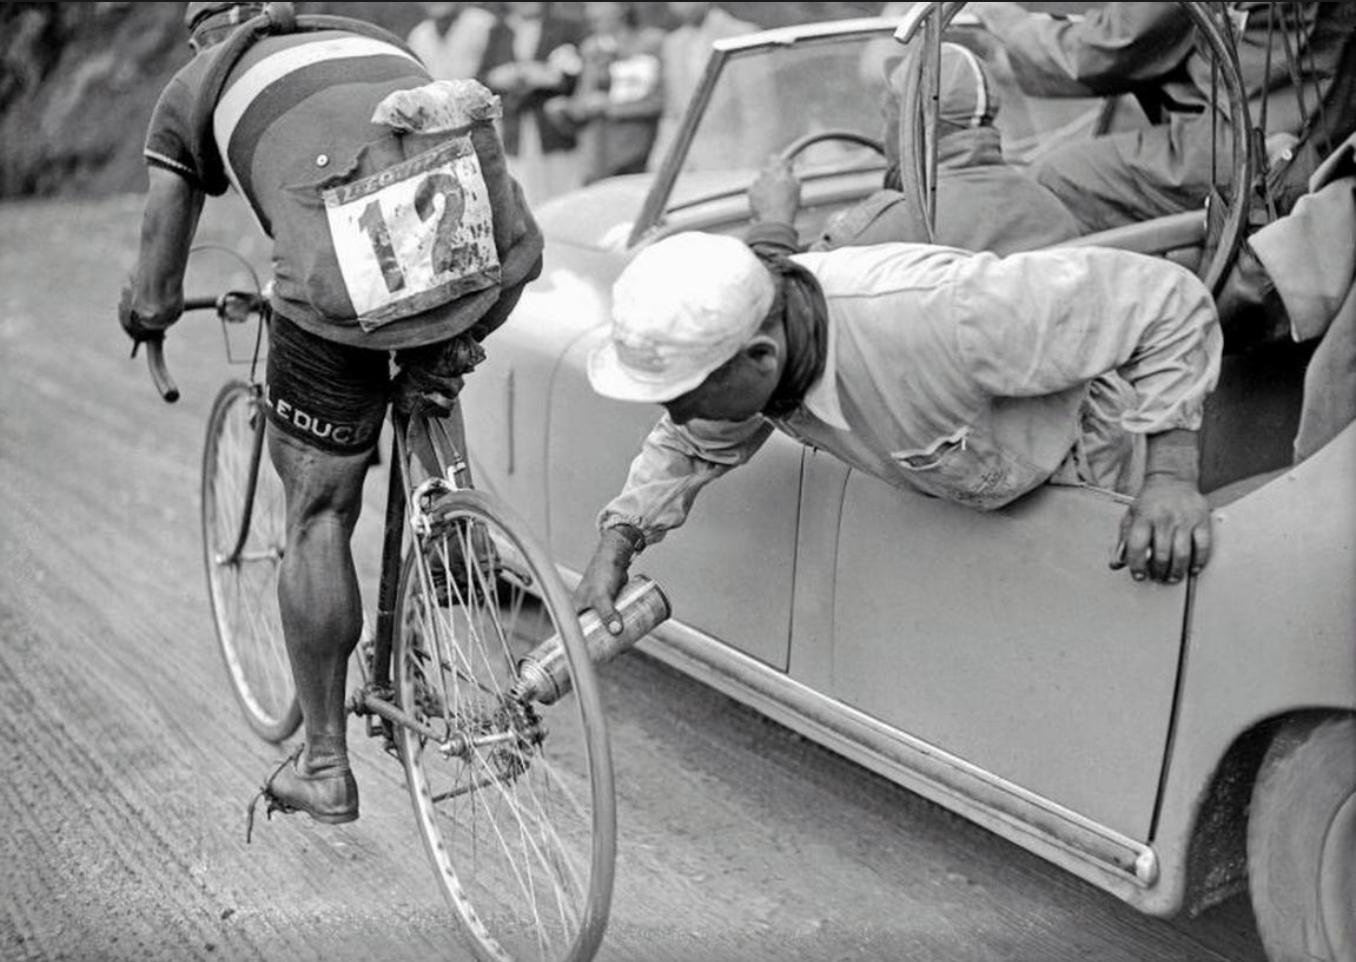 Tour de France 1949 - Gino Sciardis